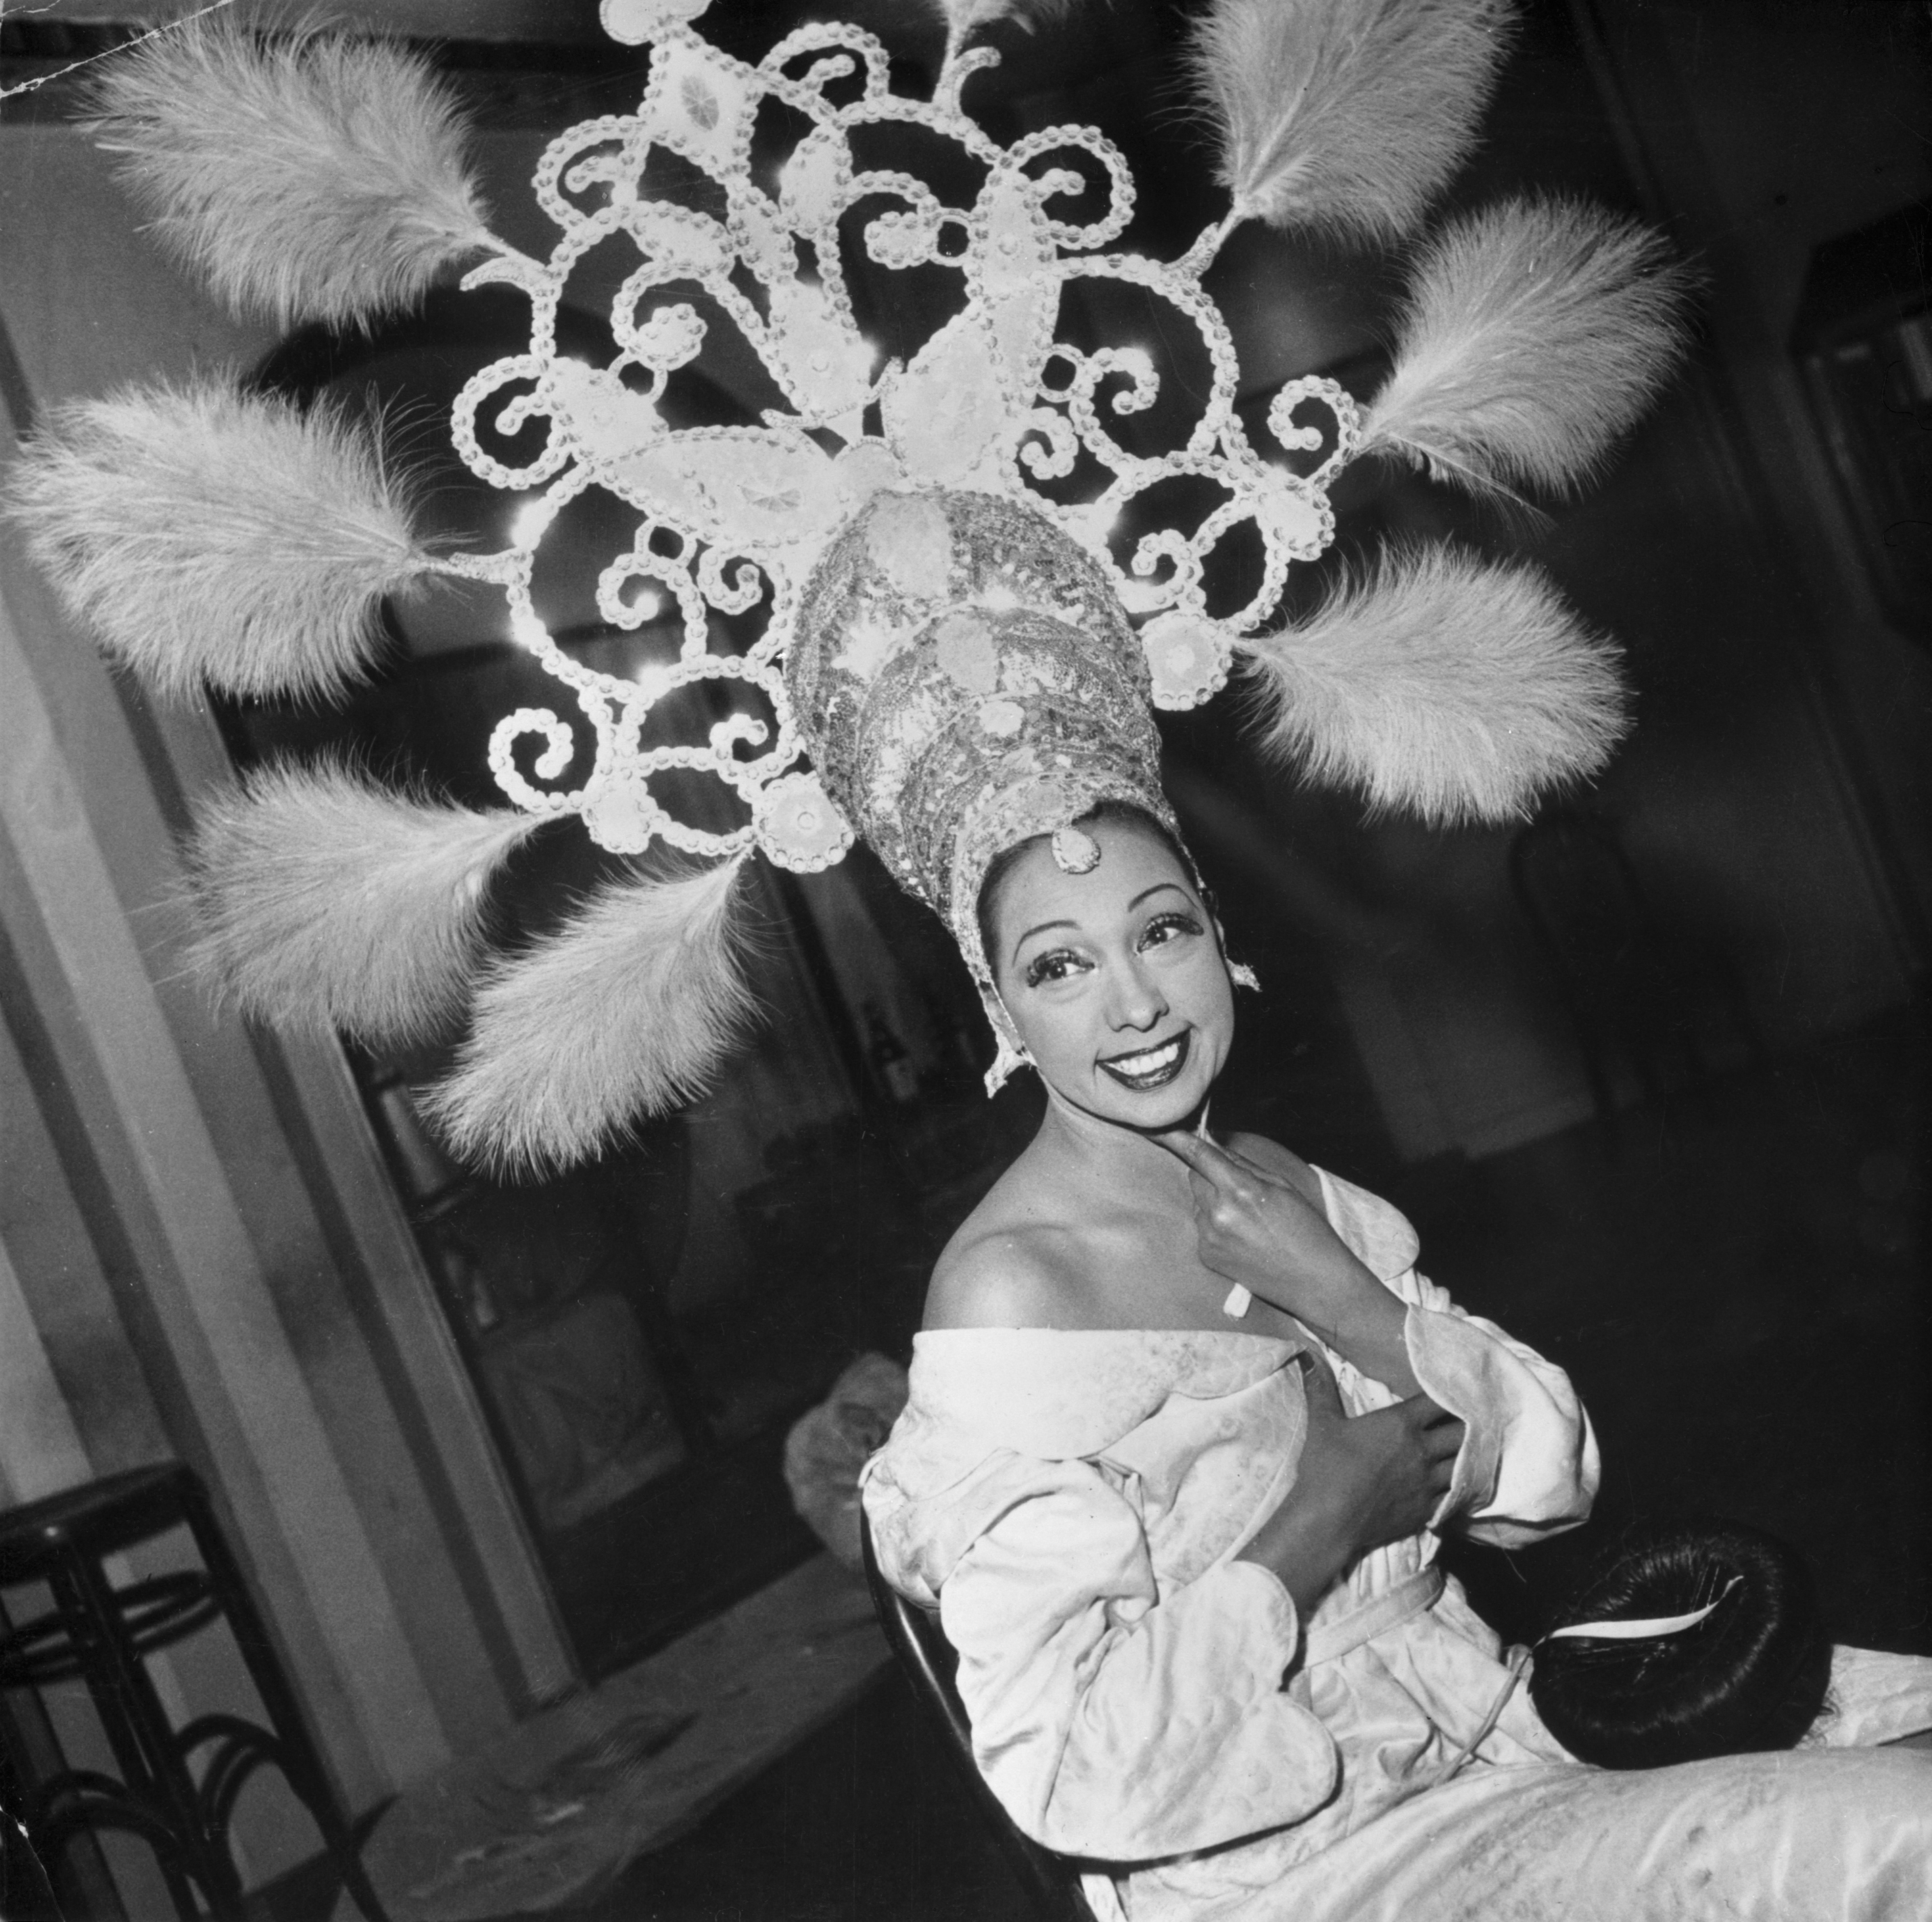 Josephine Baker Wearing Elaborate Headdress